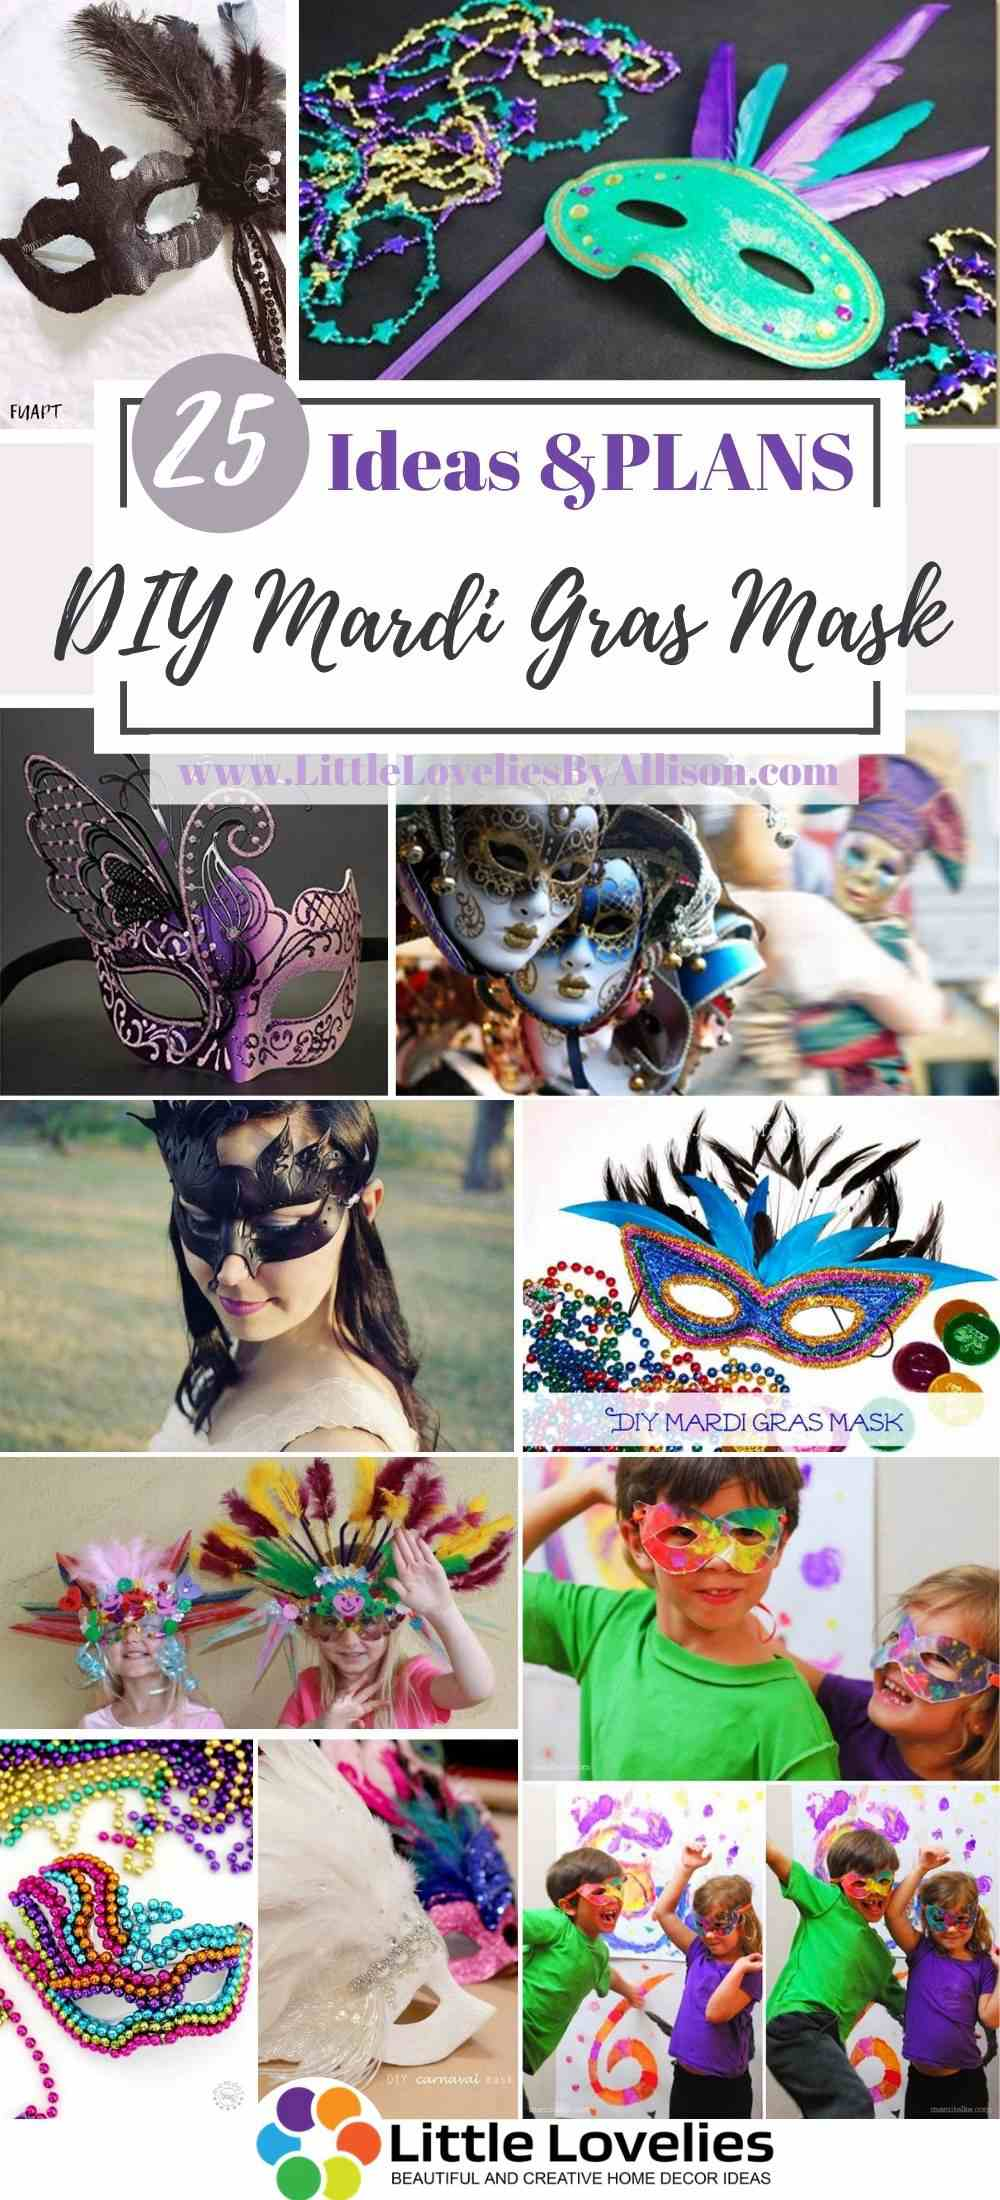 Best-DIY-Mardi-Gras-Mask